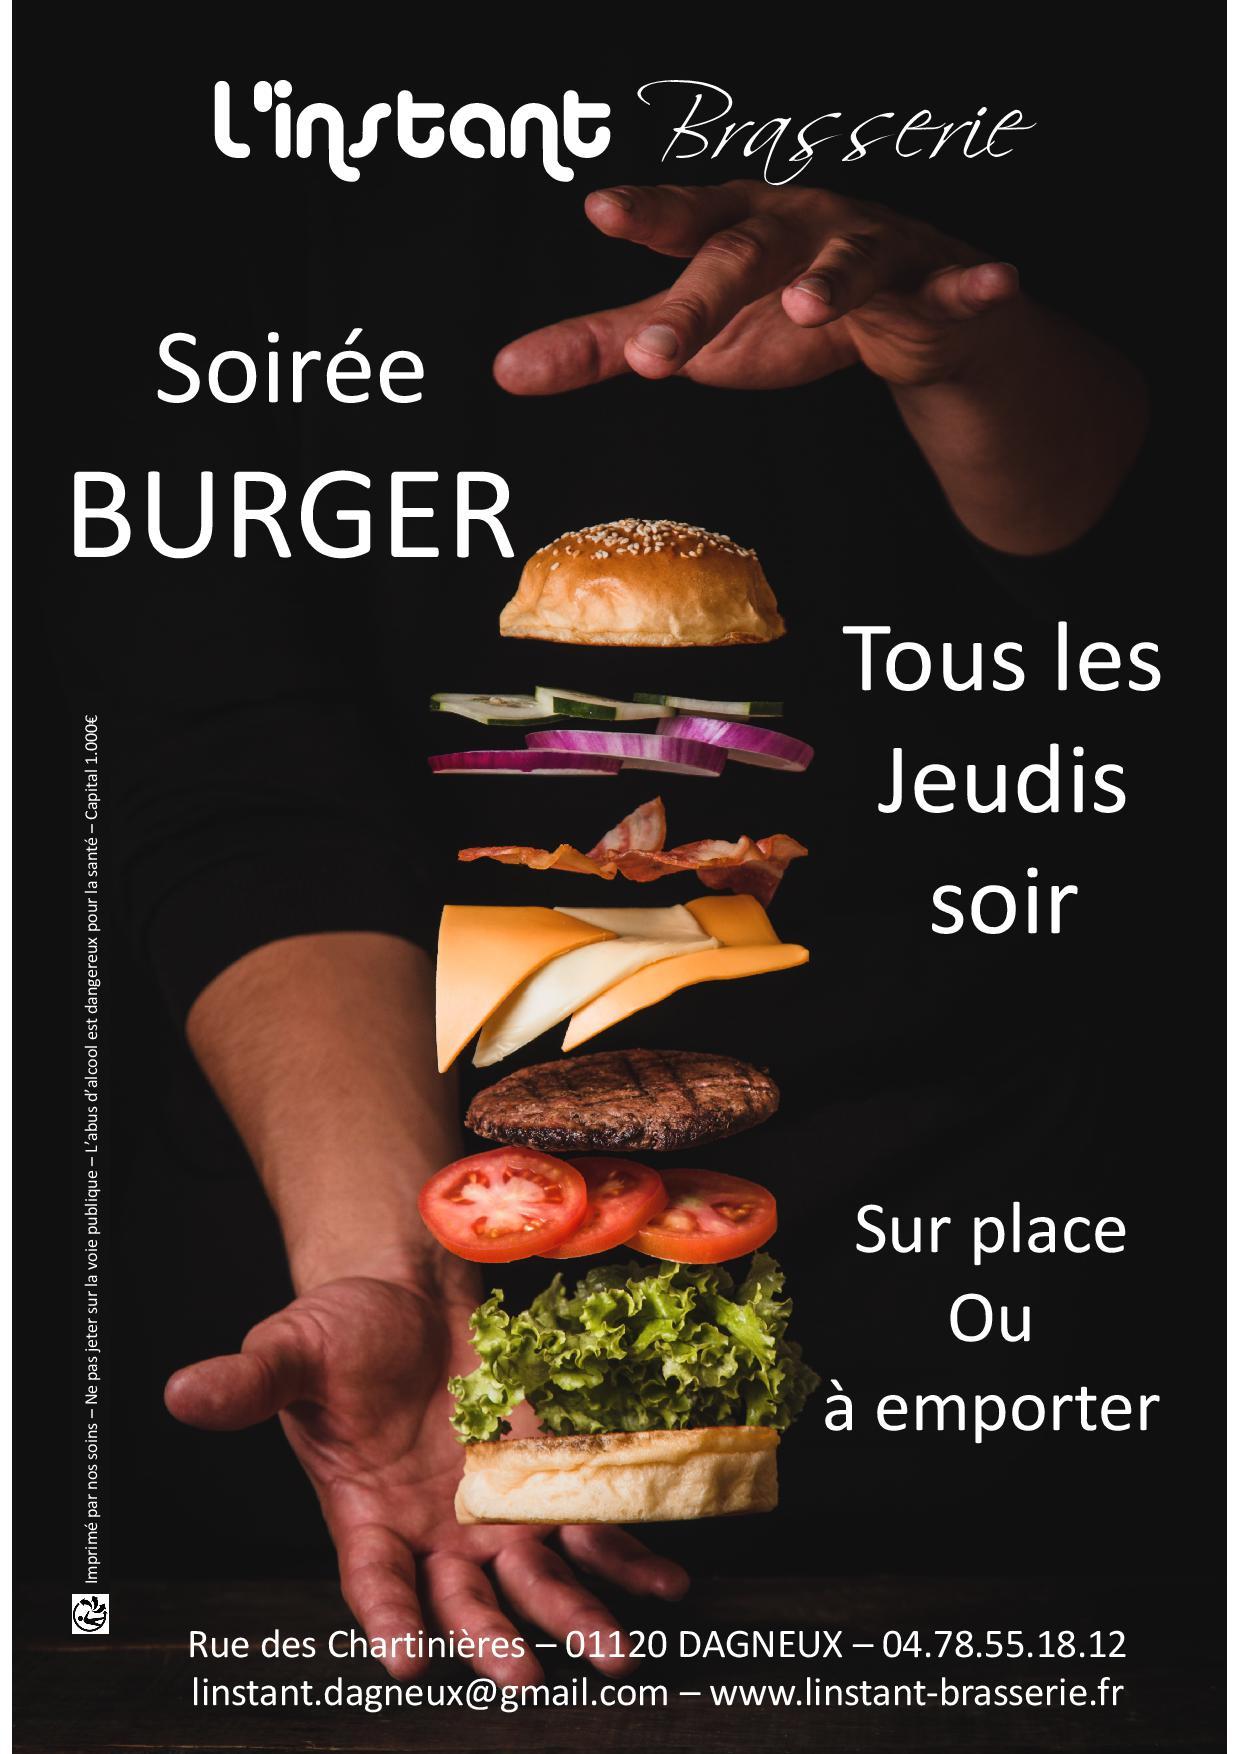 Soirée BURGER